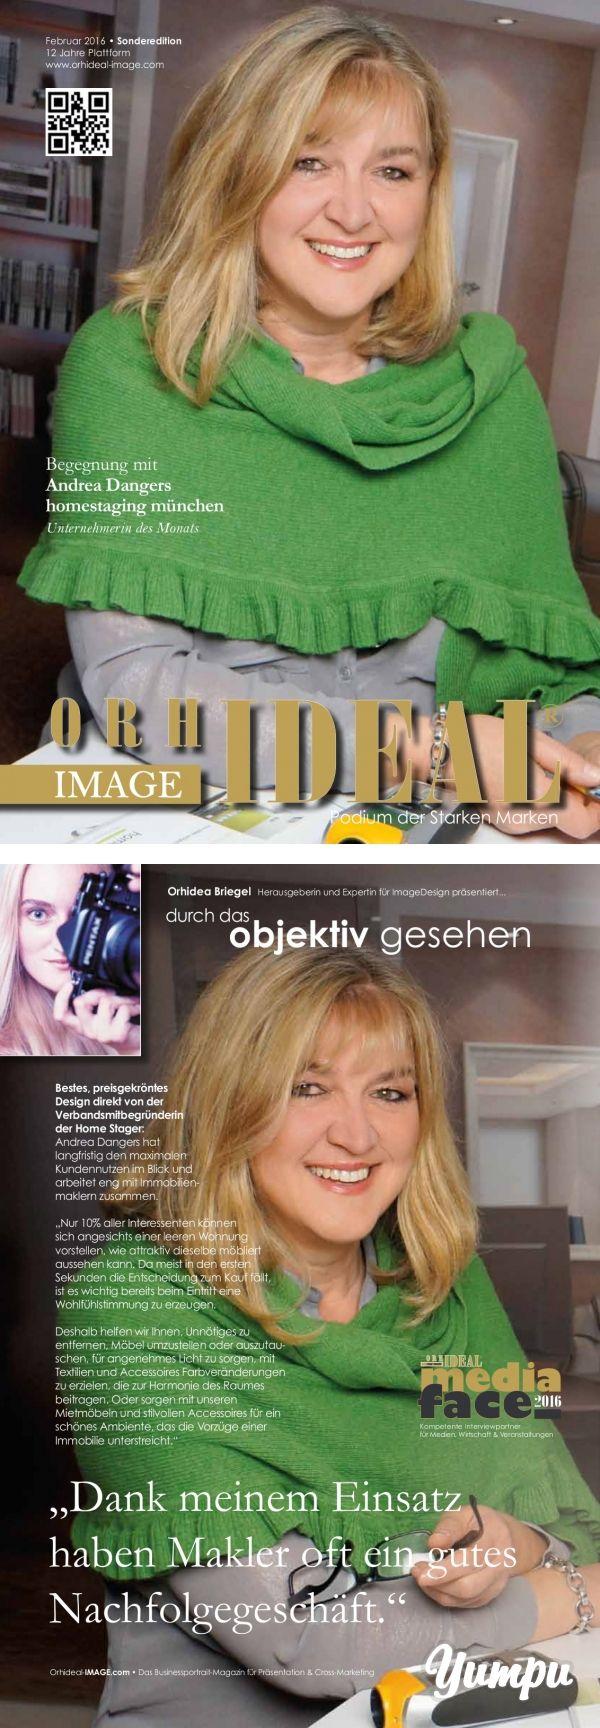 Wundervoll Homestaging München Ideen Von Orhideal Image Magazin - Januar 2016 -